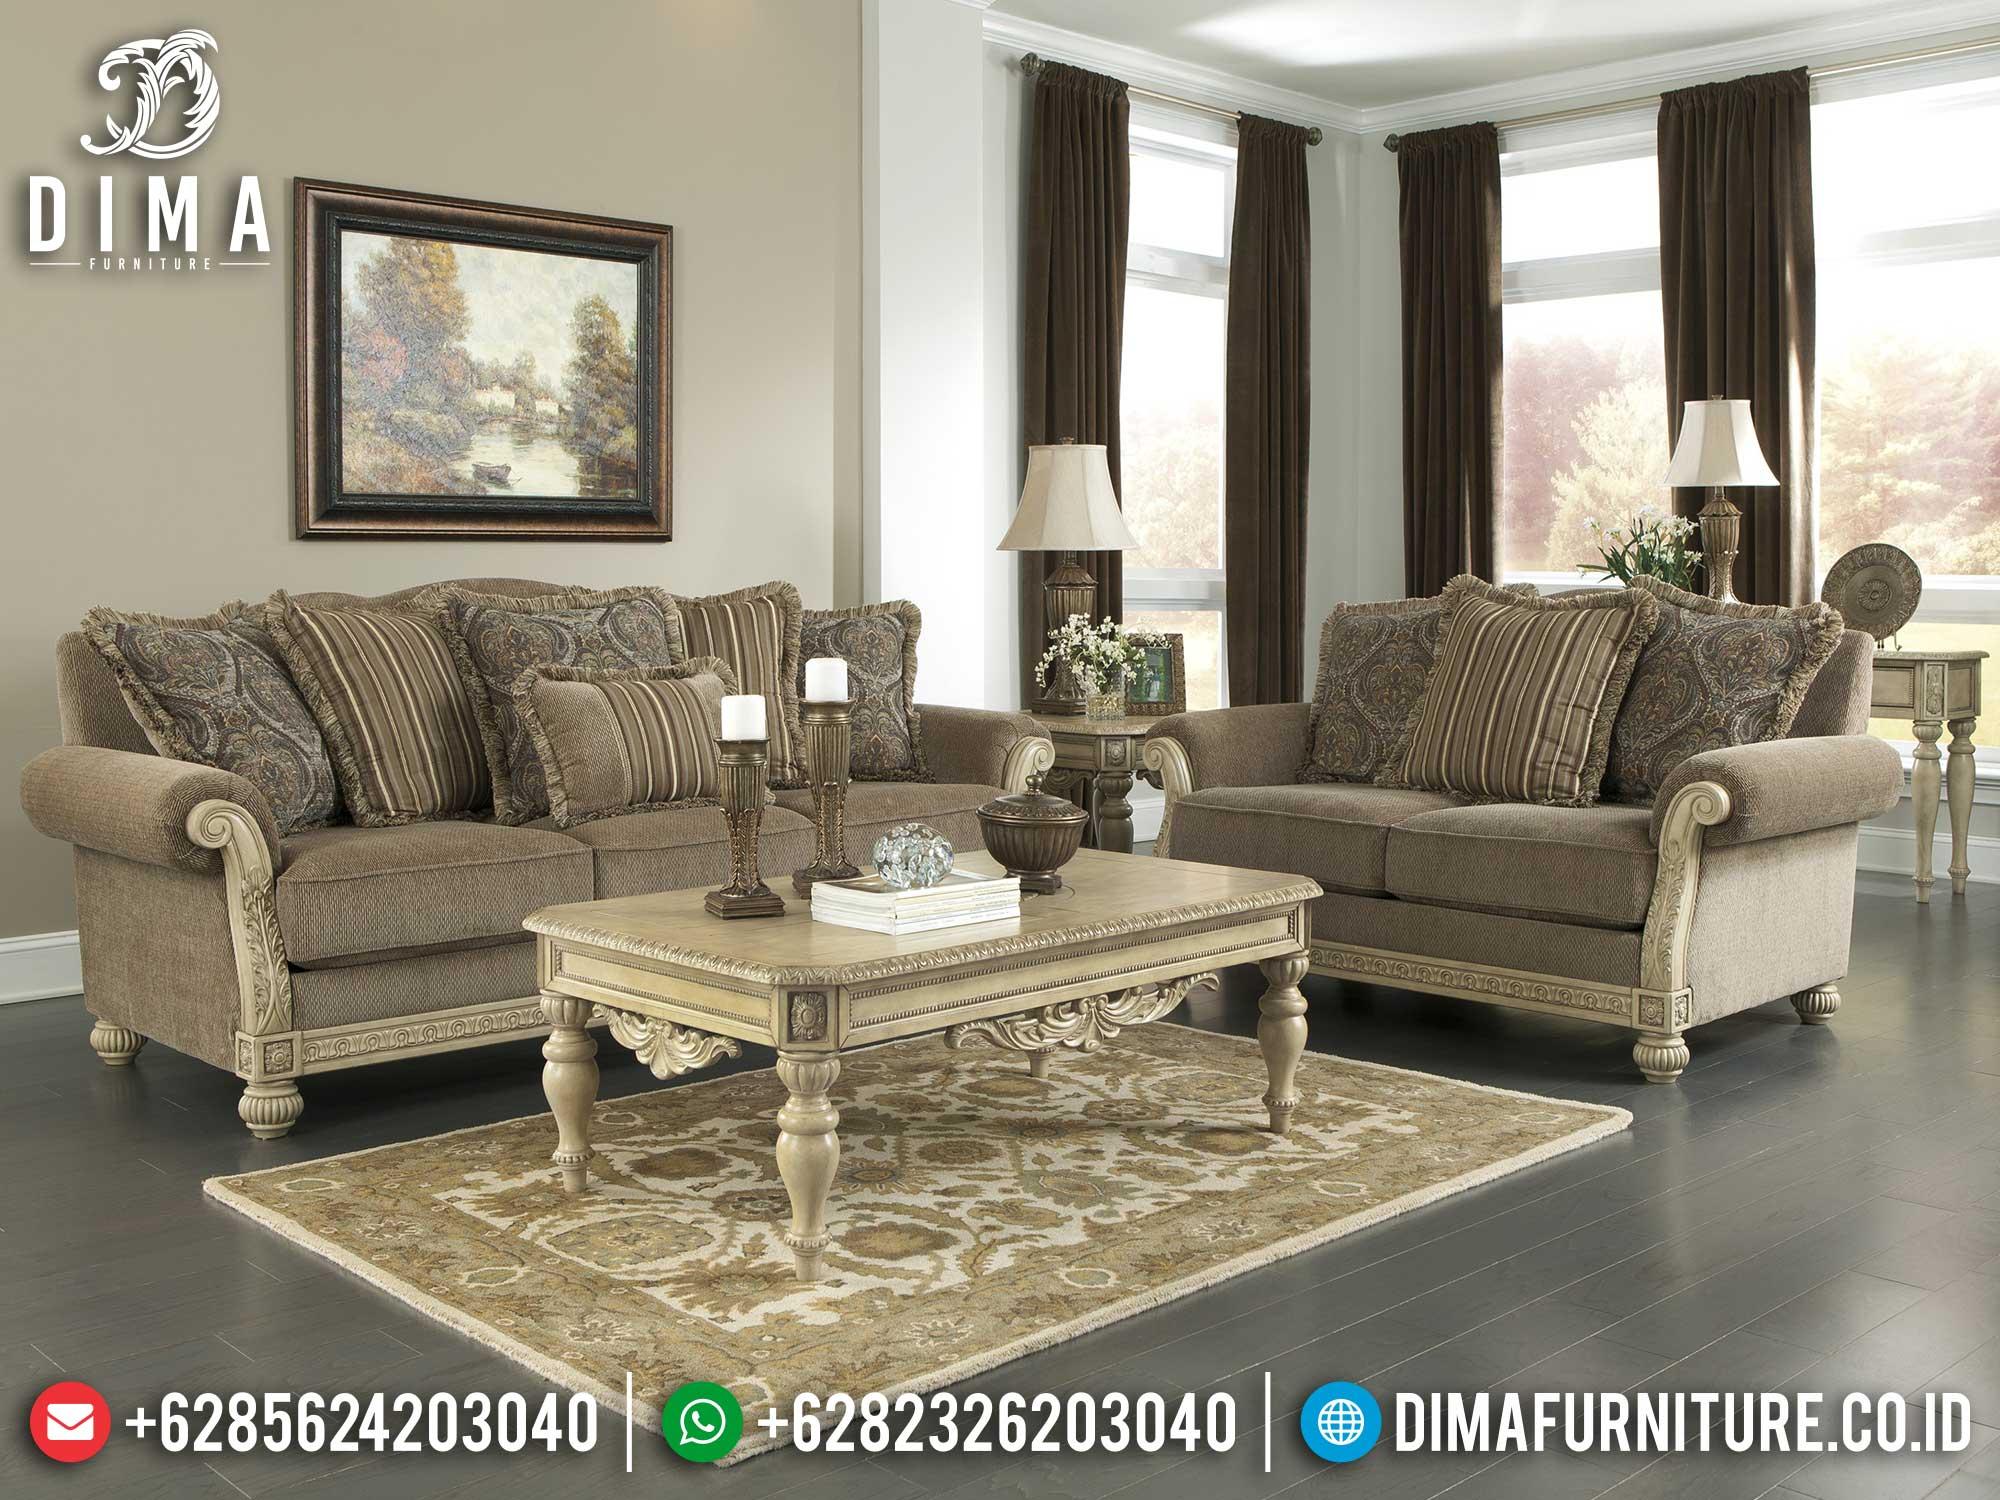 Model Sofa Tamu Minimalis Terbaru High Quality Classic Design Mm-0932